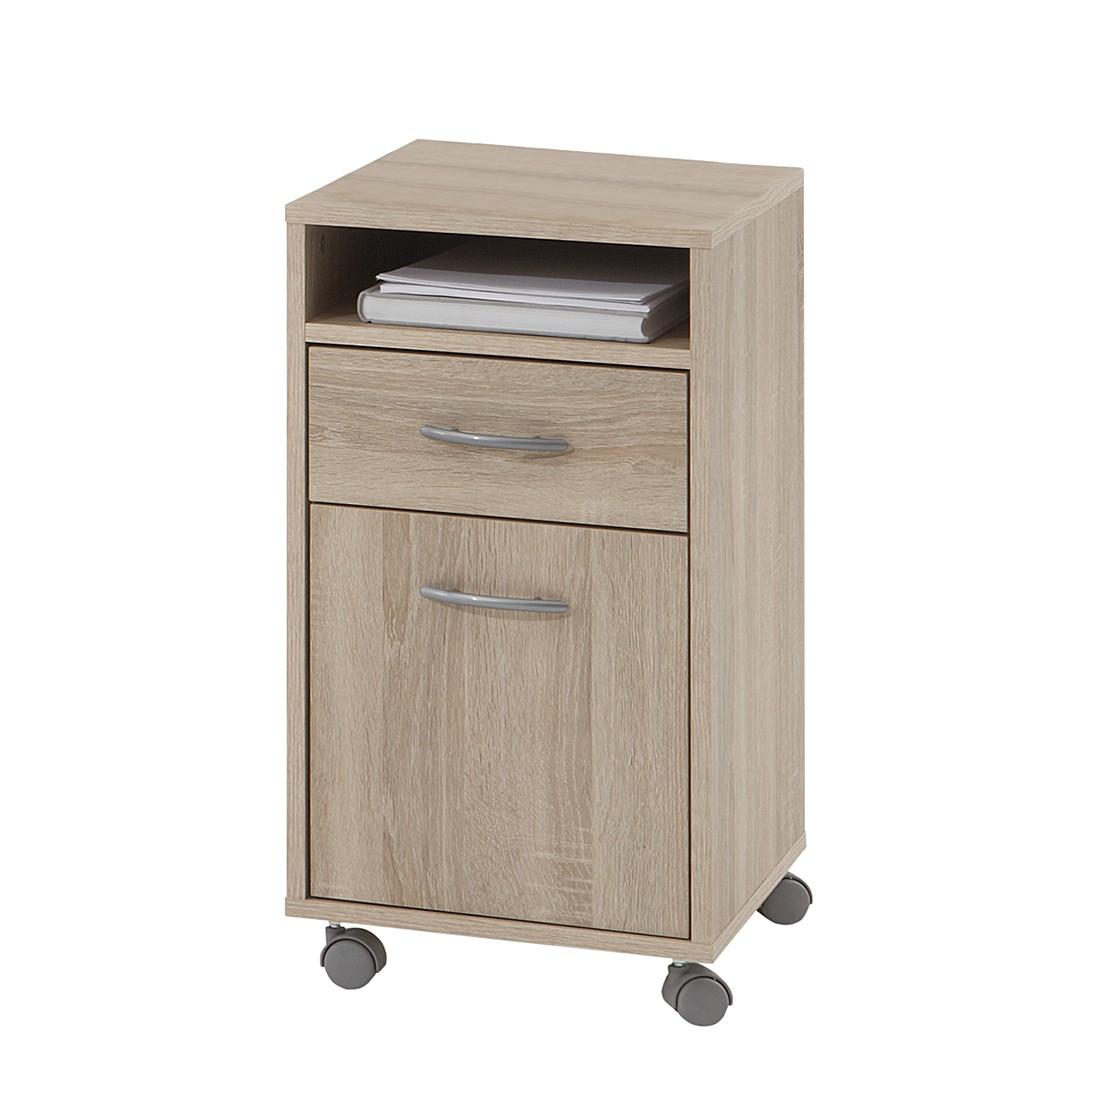 Home 24 - Caisson à tiroirs à roulettes finch - imitation chêne, home24 office